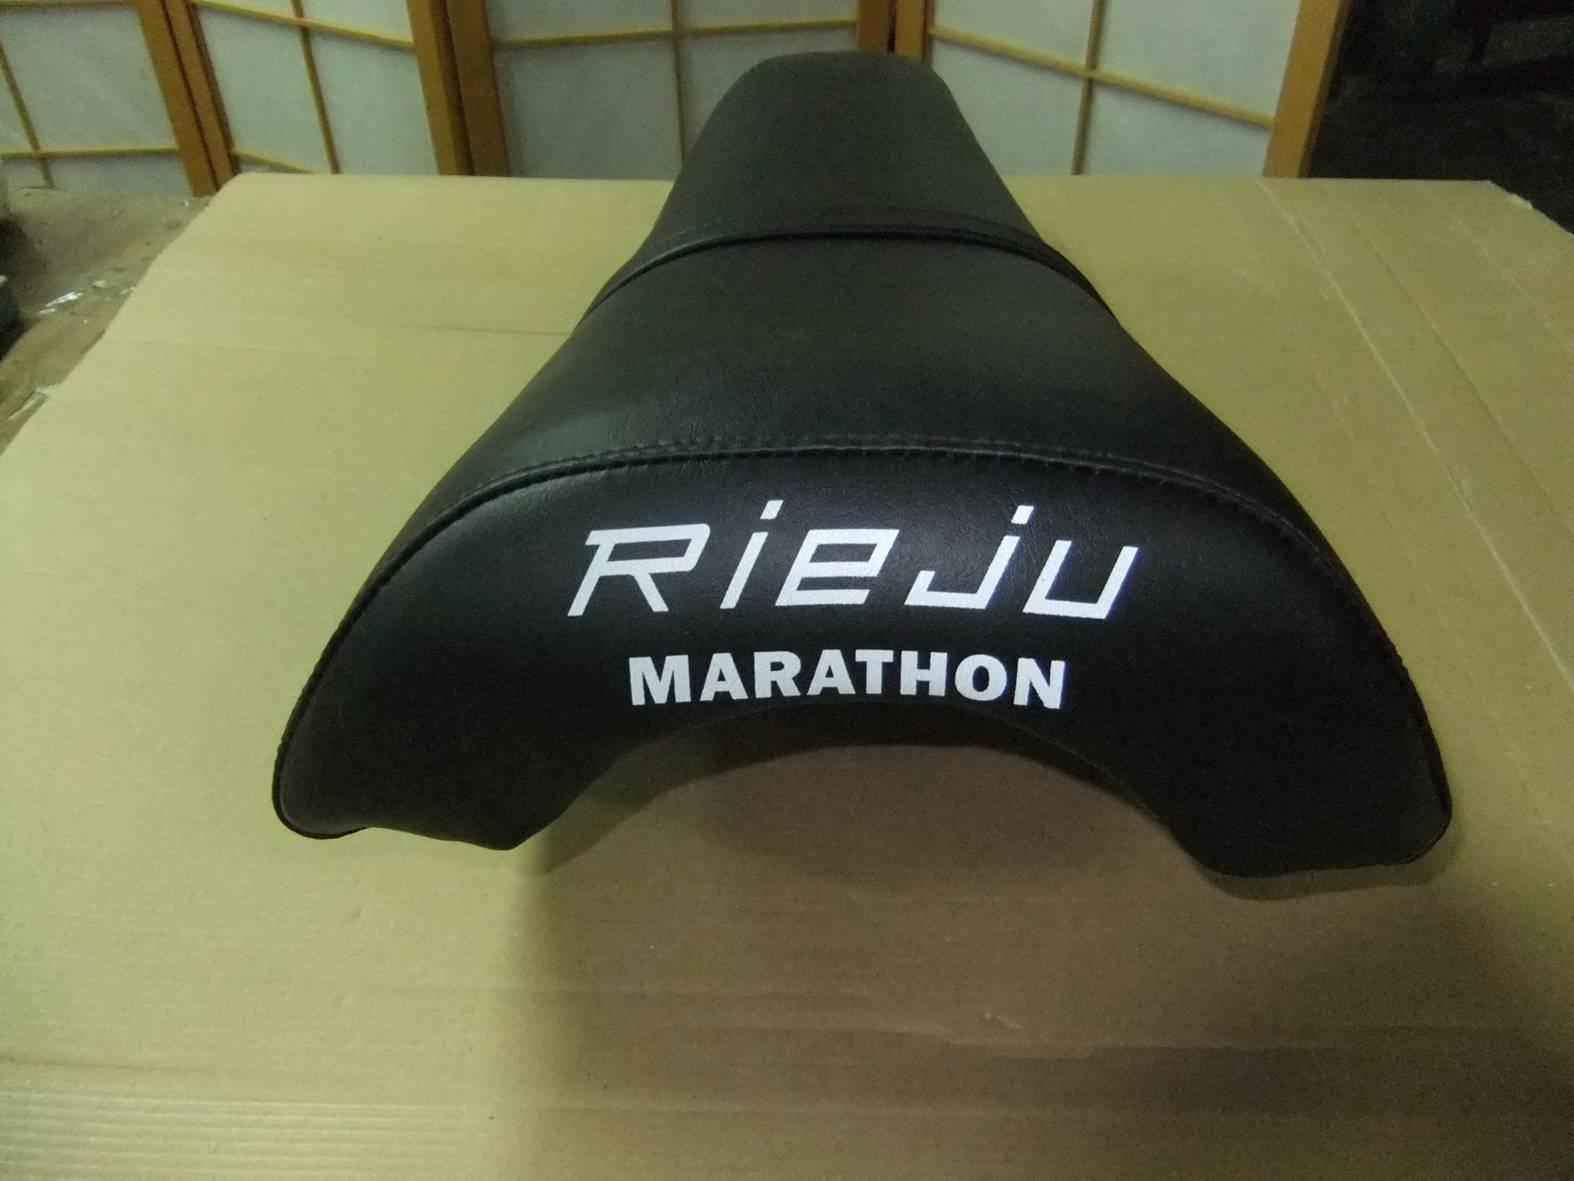 Por fin la conseguí: Rieju Marathon 74 2ªserie - Página 5 1440a6u